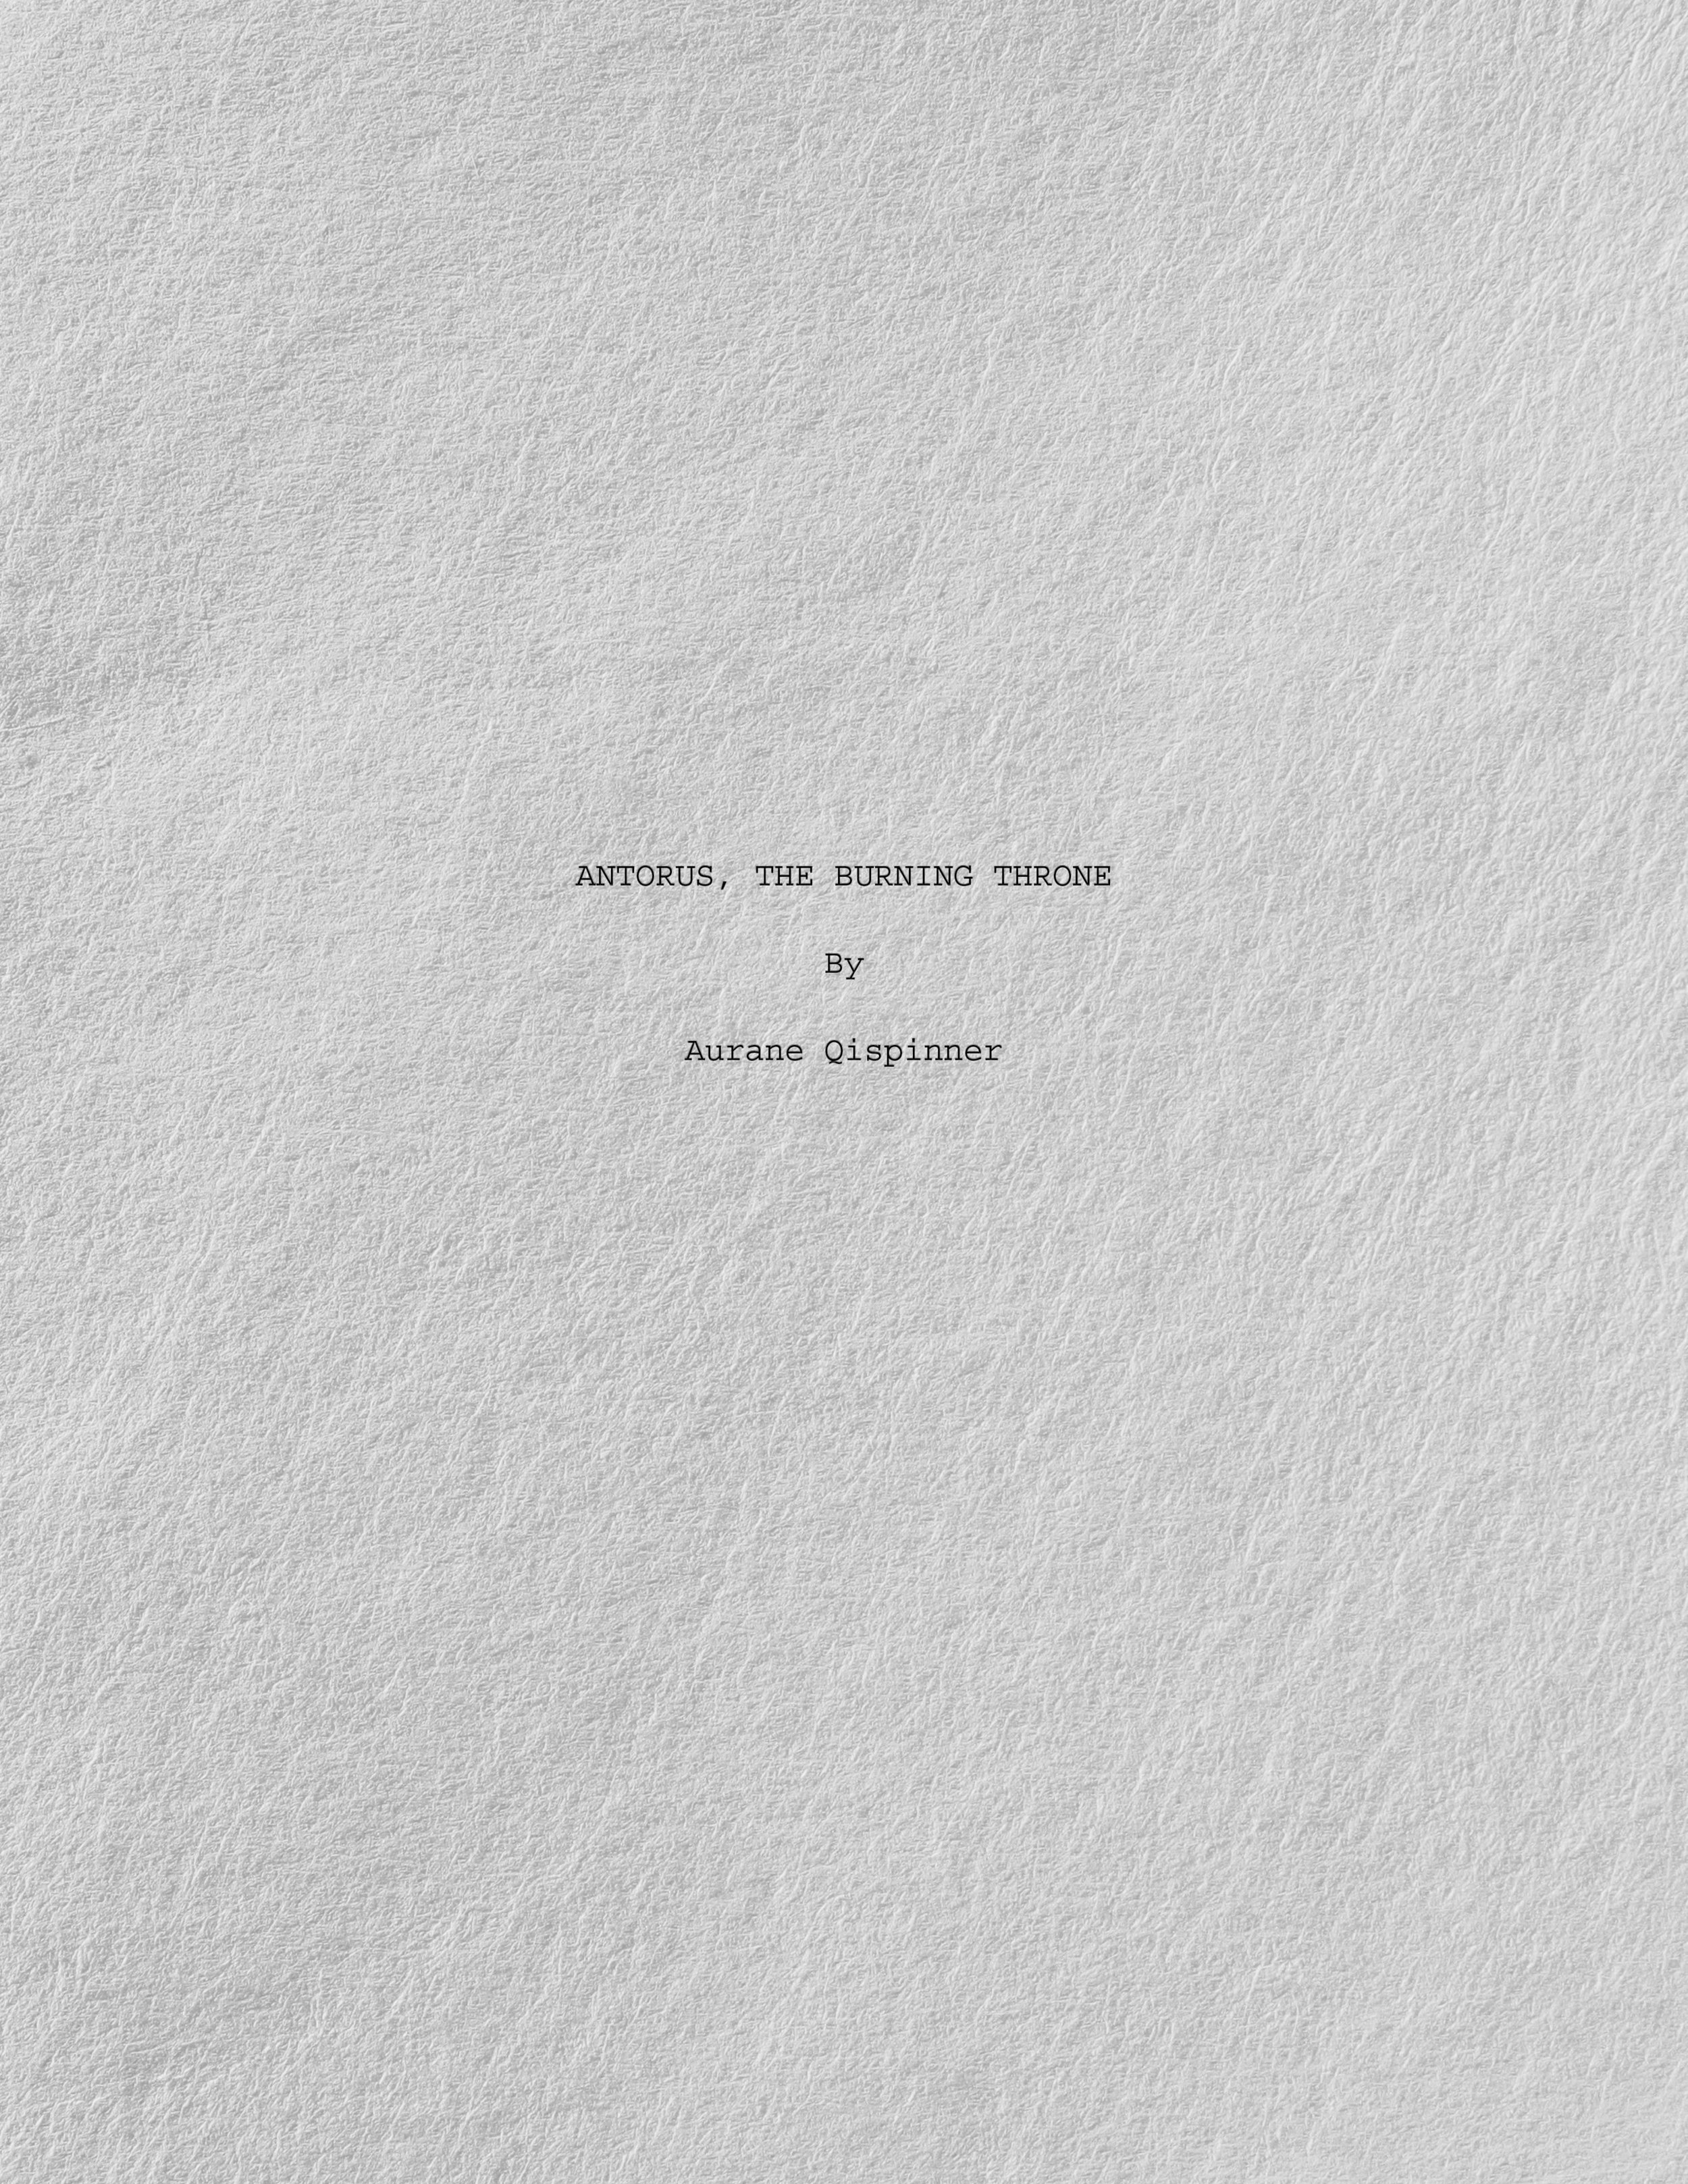 Auranes-screenplay-1.jpg